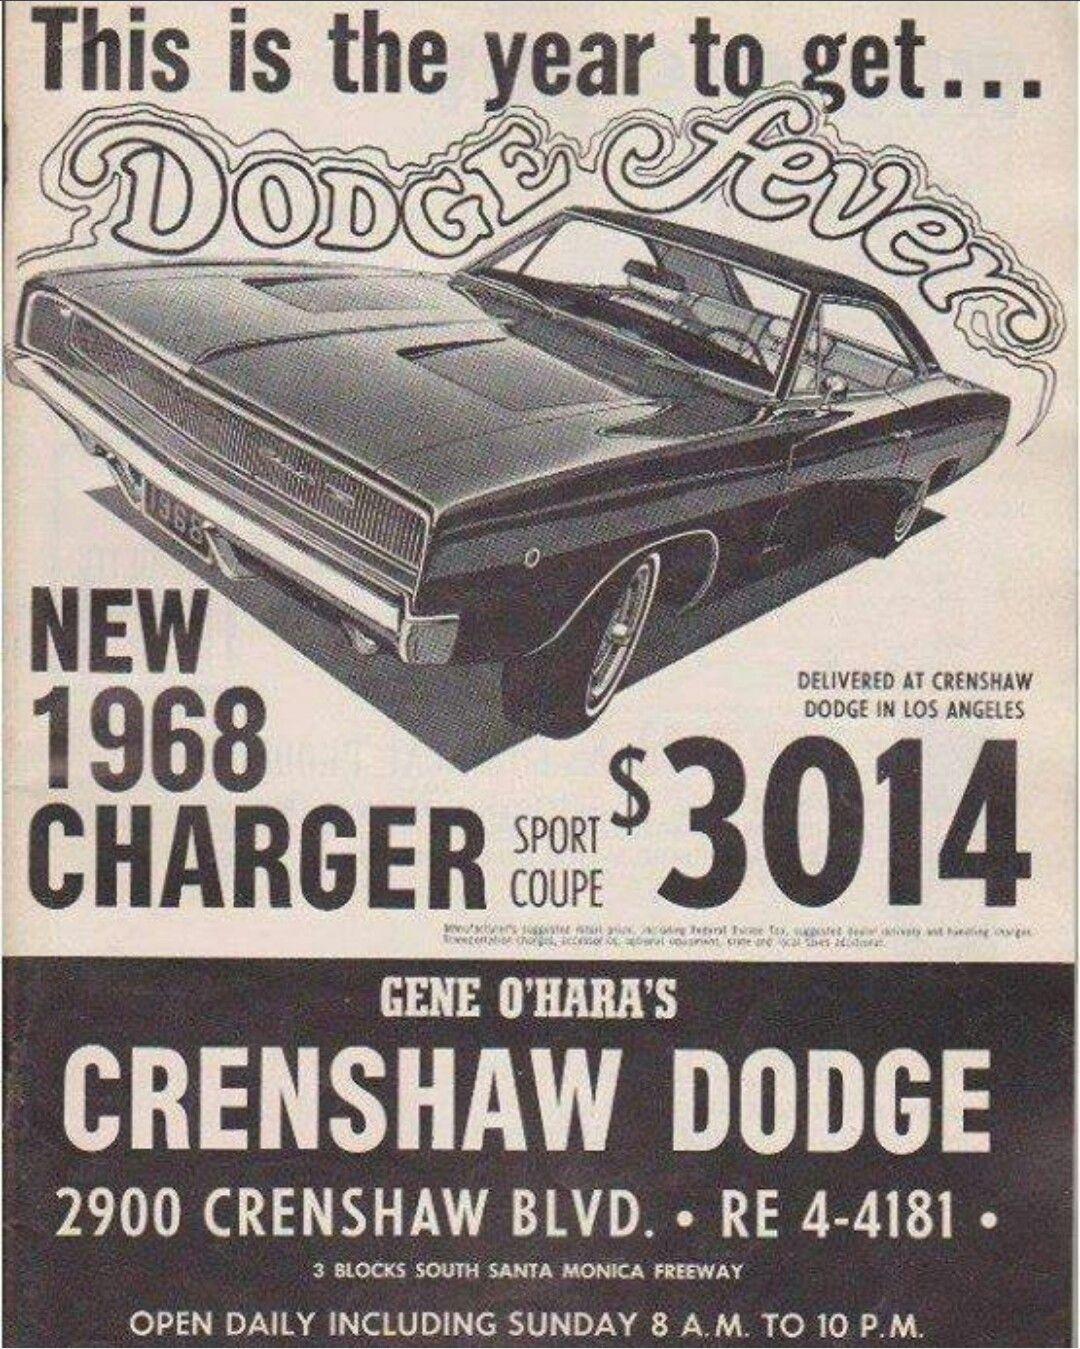 1968 Dodge Charger Ad Dodge Charger 1968 Dodge Charger Mopar